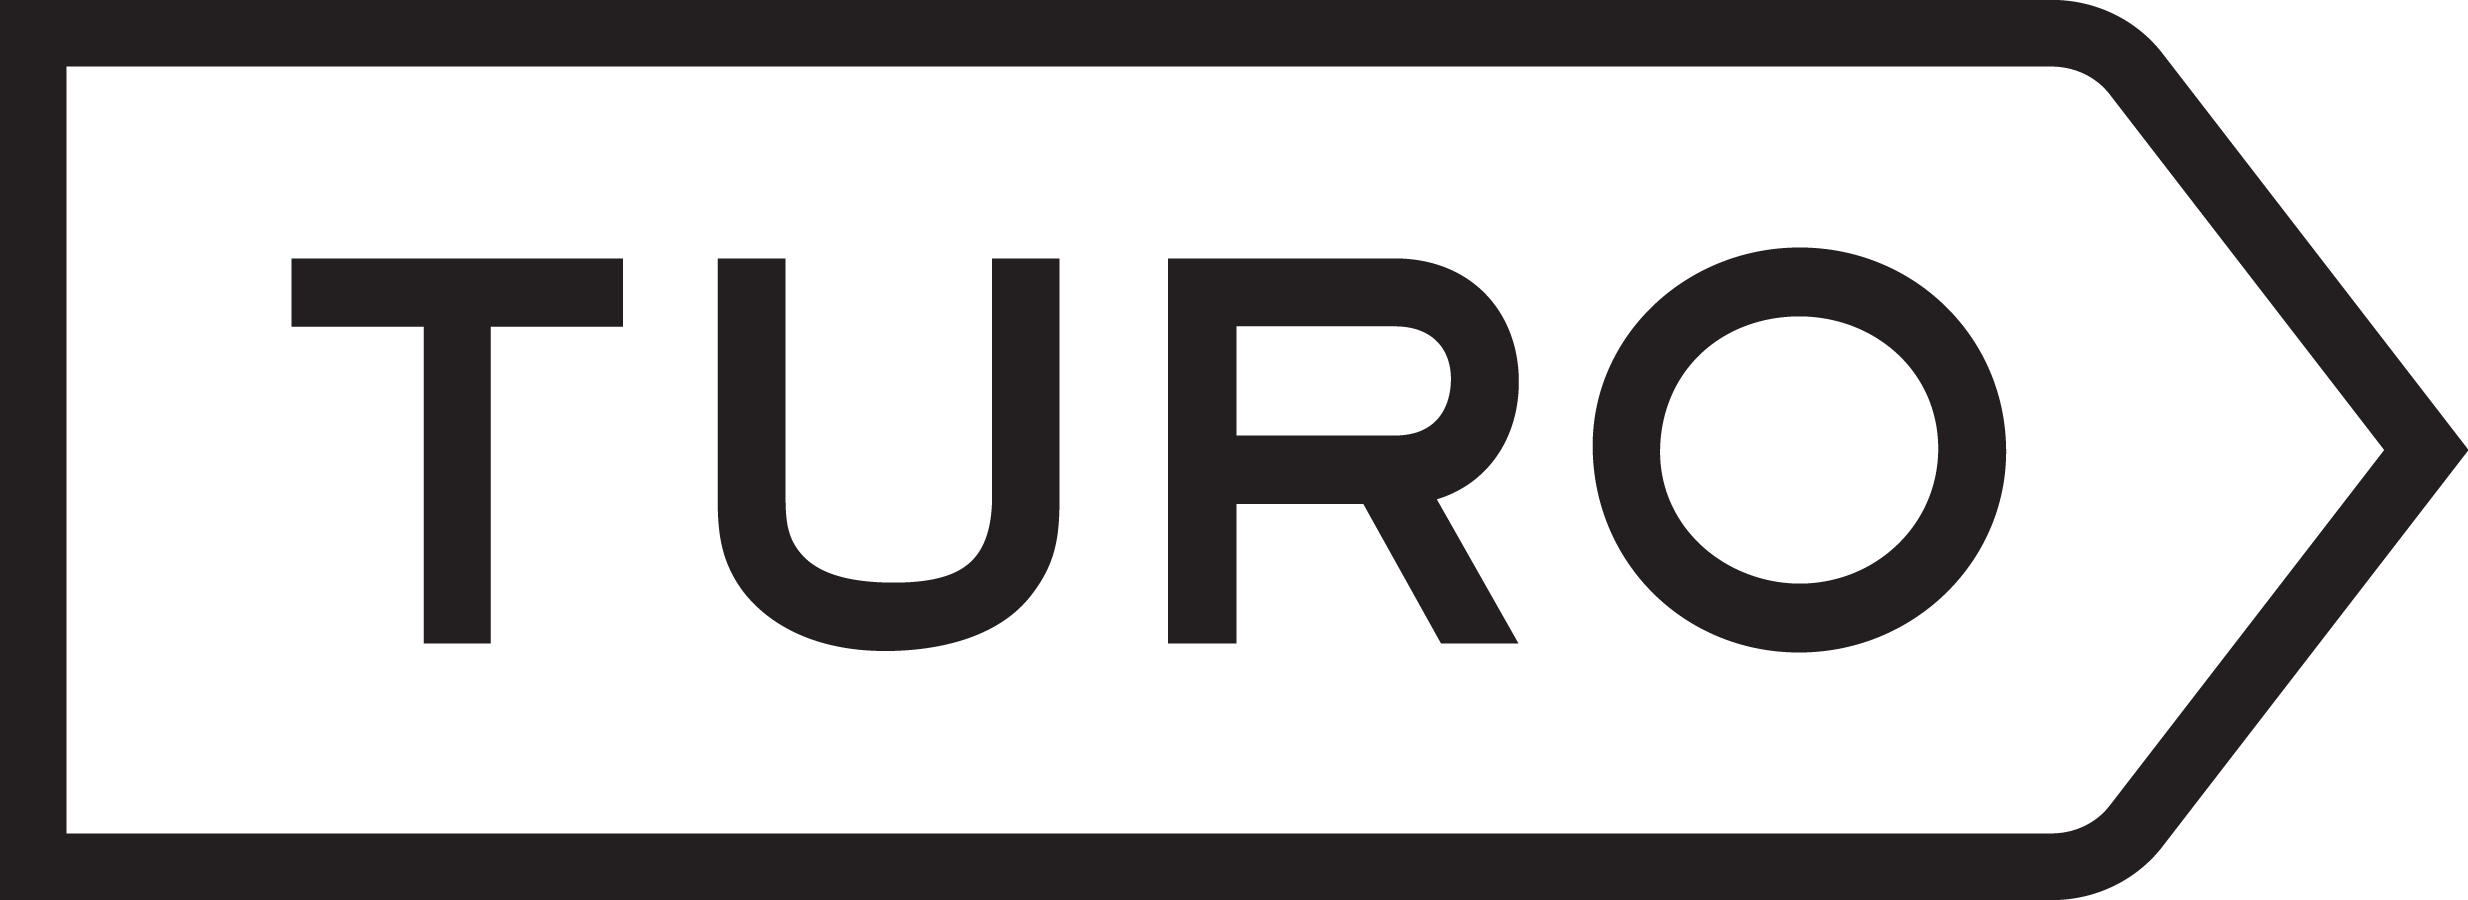 Turo Inc. logo